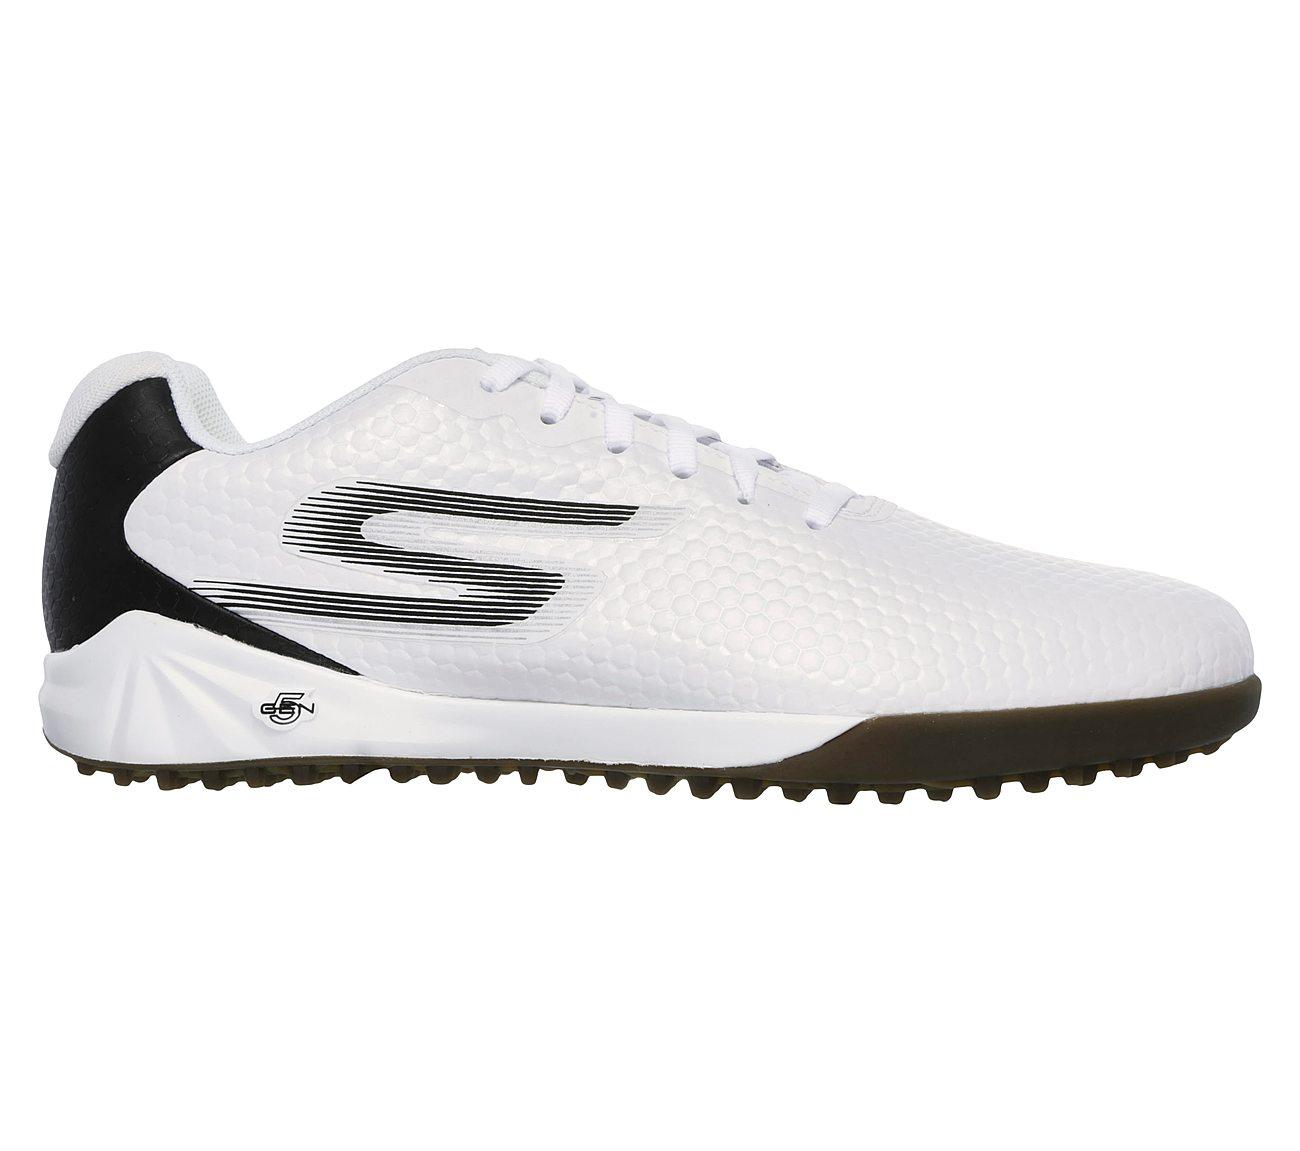 Soccer Hexgo Skechers Performance Shoes